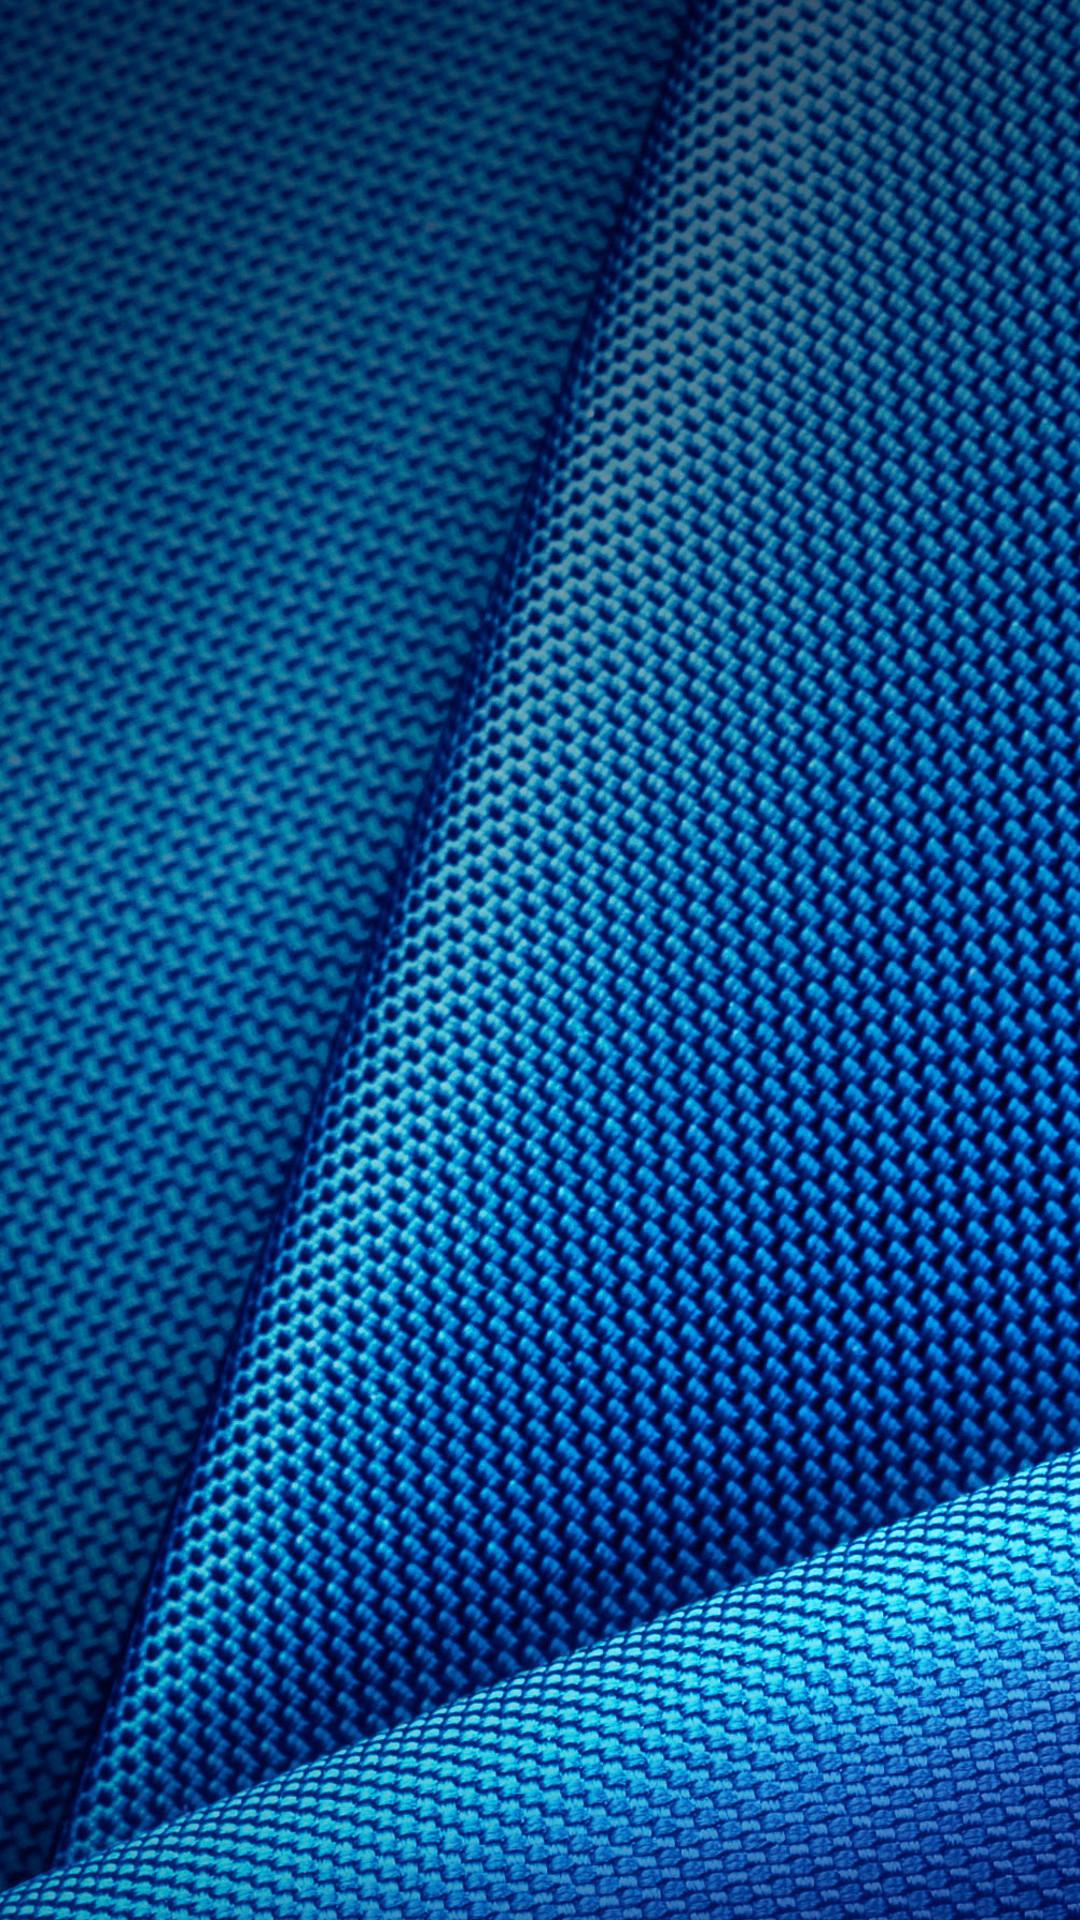 Mermaid Scales Wallpapers 183 ① Wallpapertag